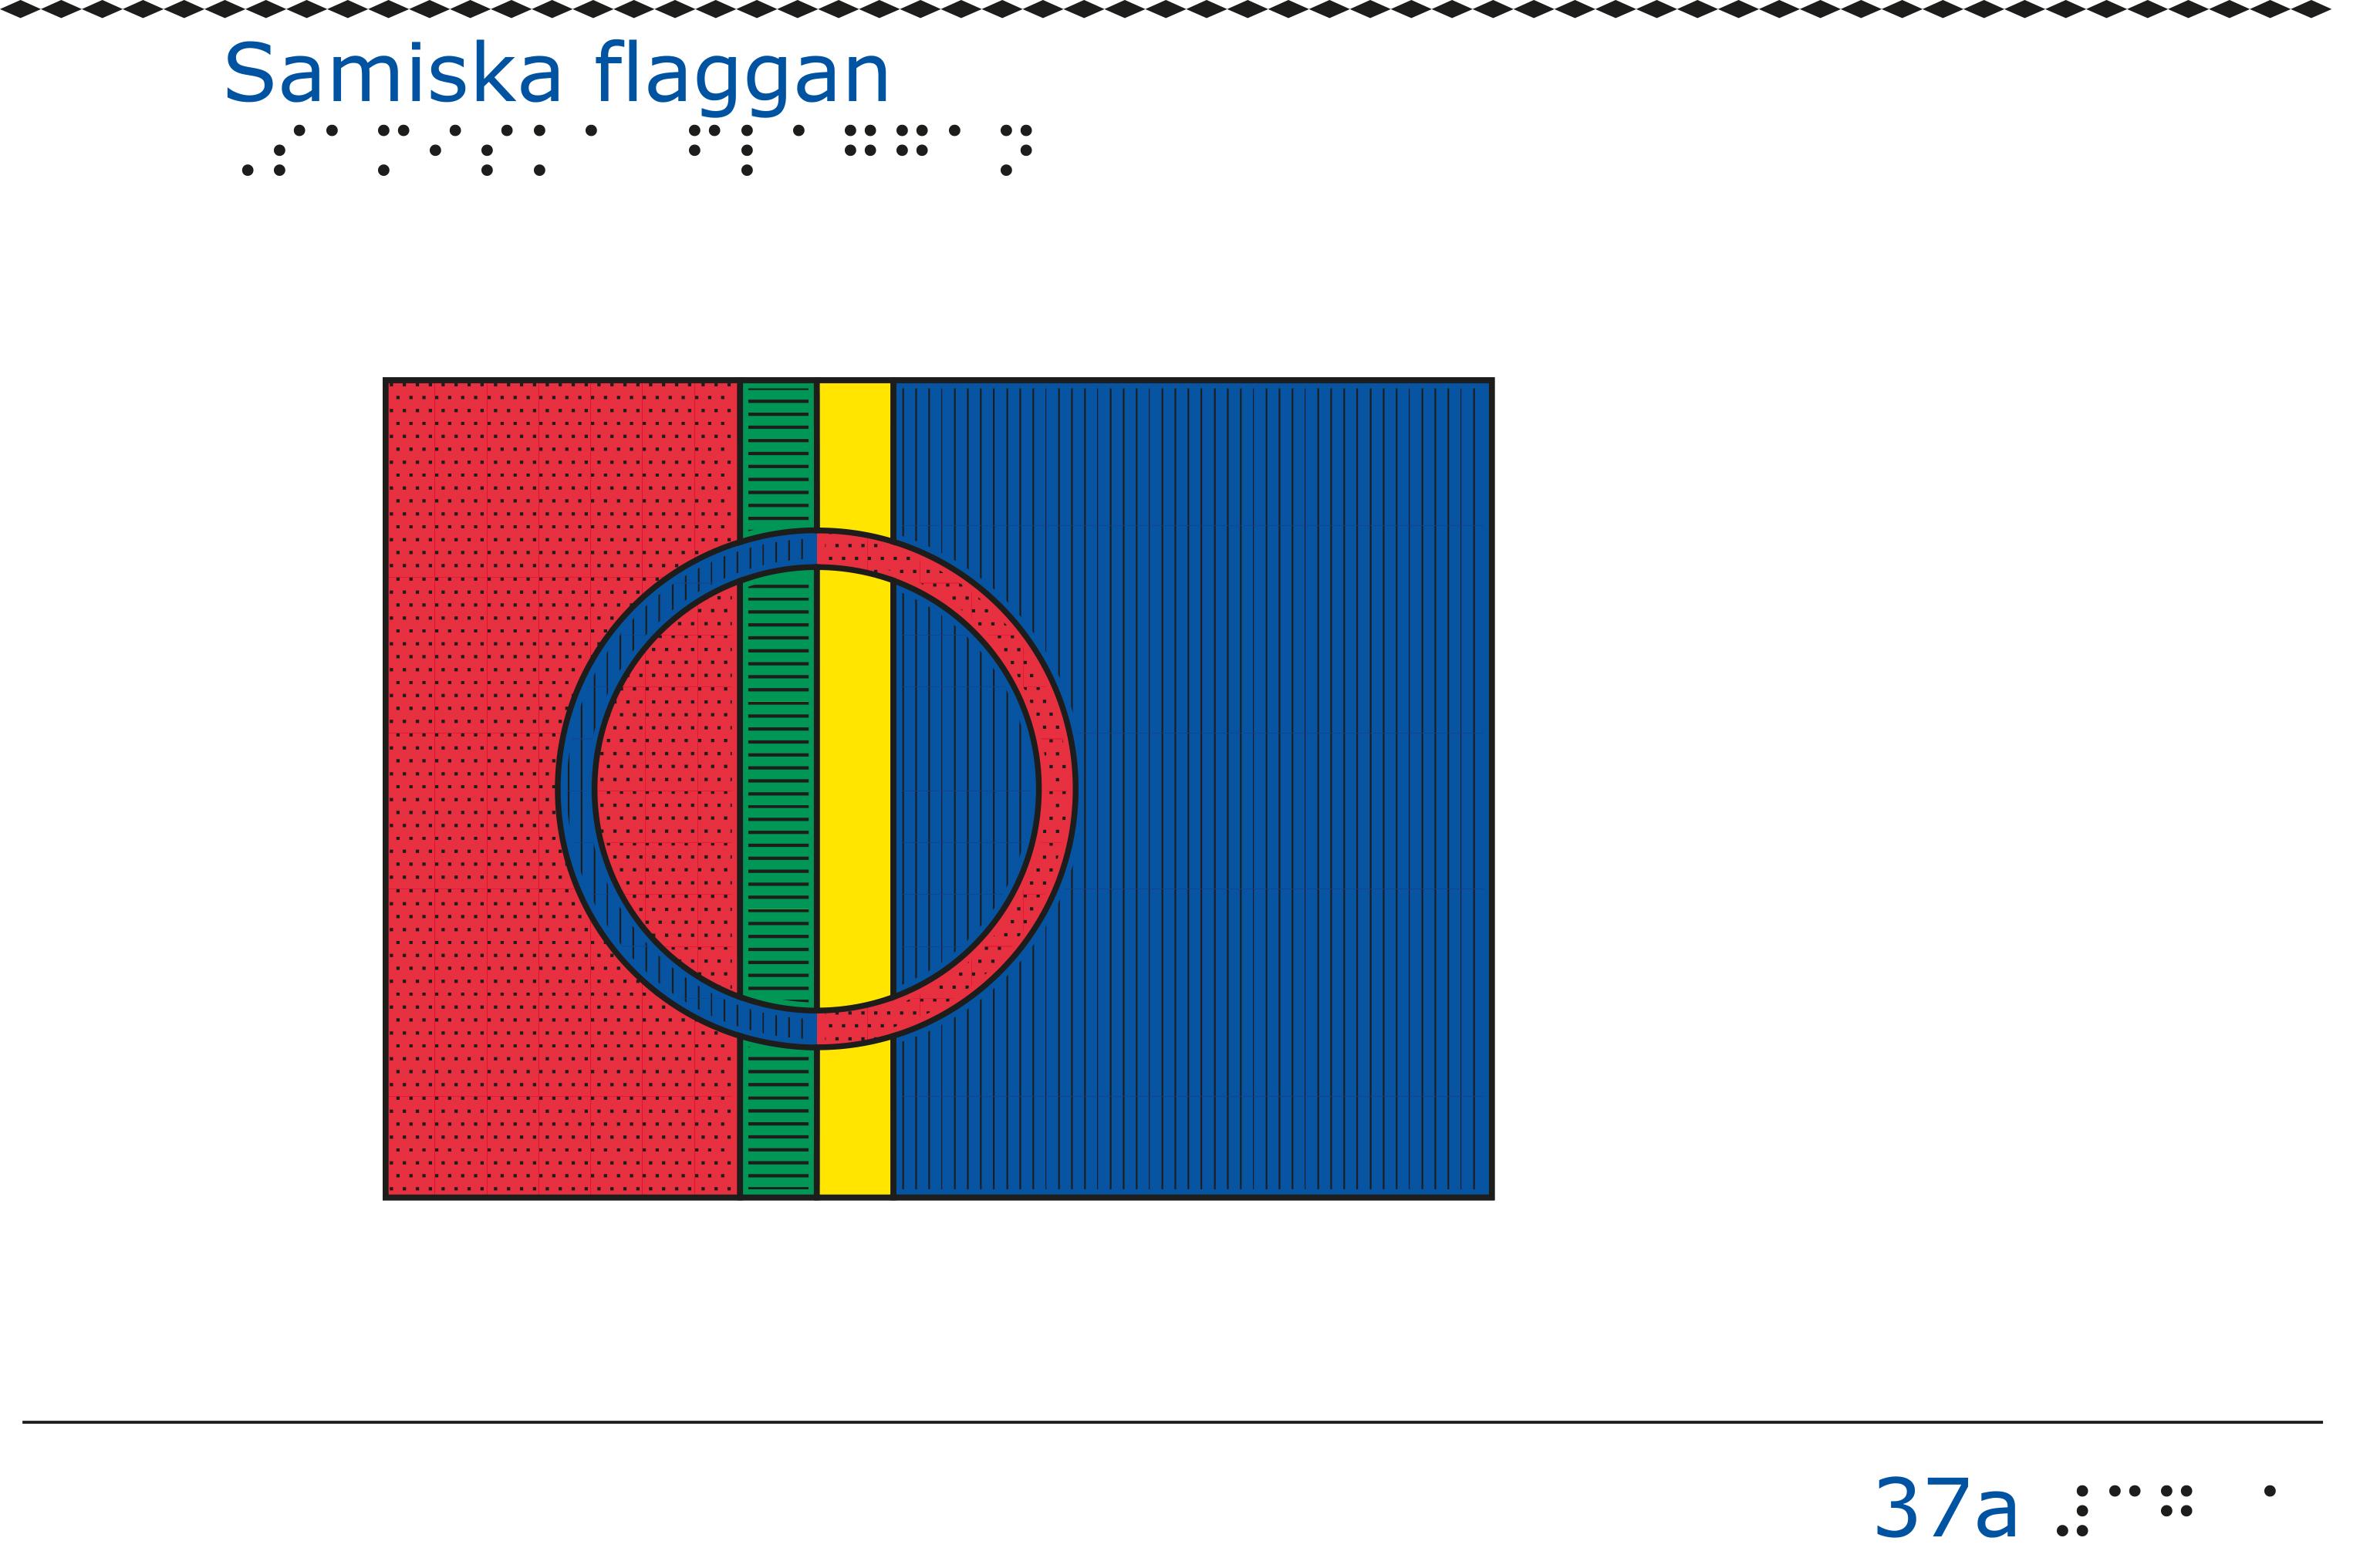 Taktil bild Samiska flaggan.